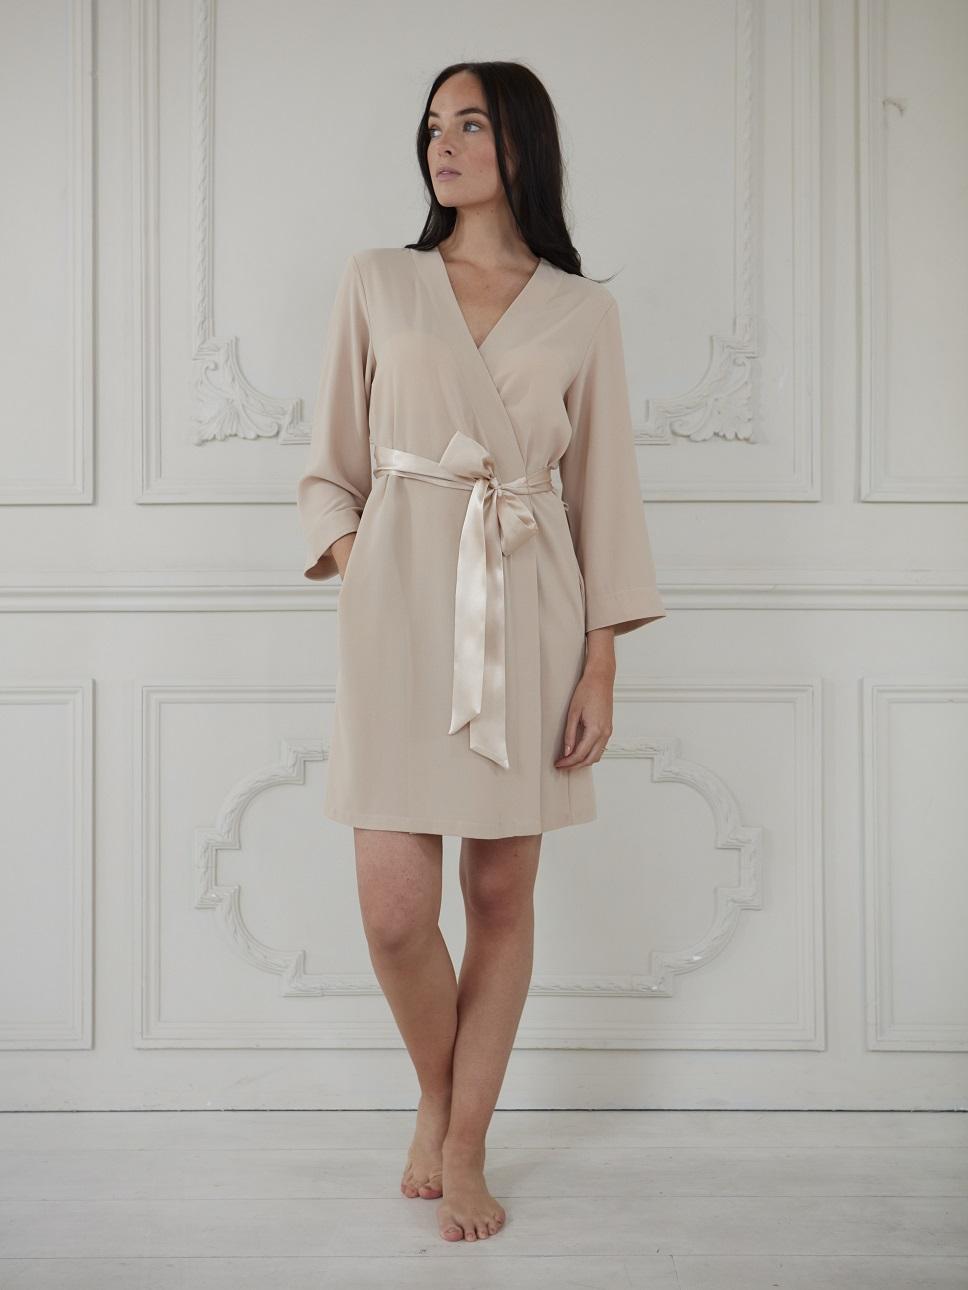 Nude luxury robe